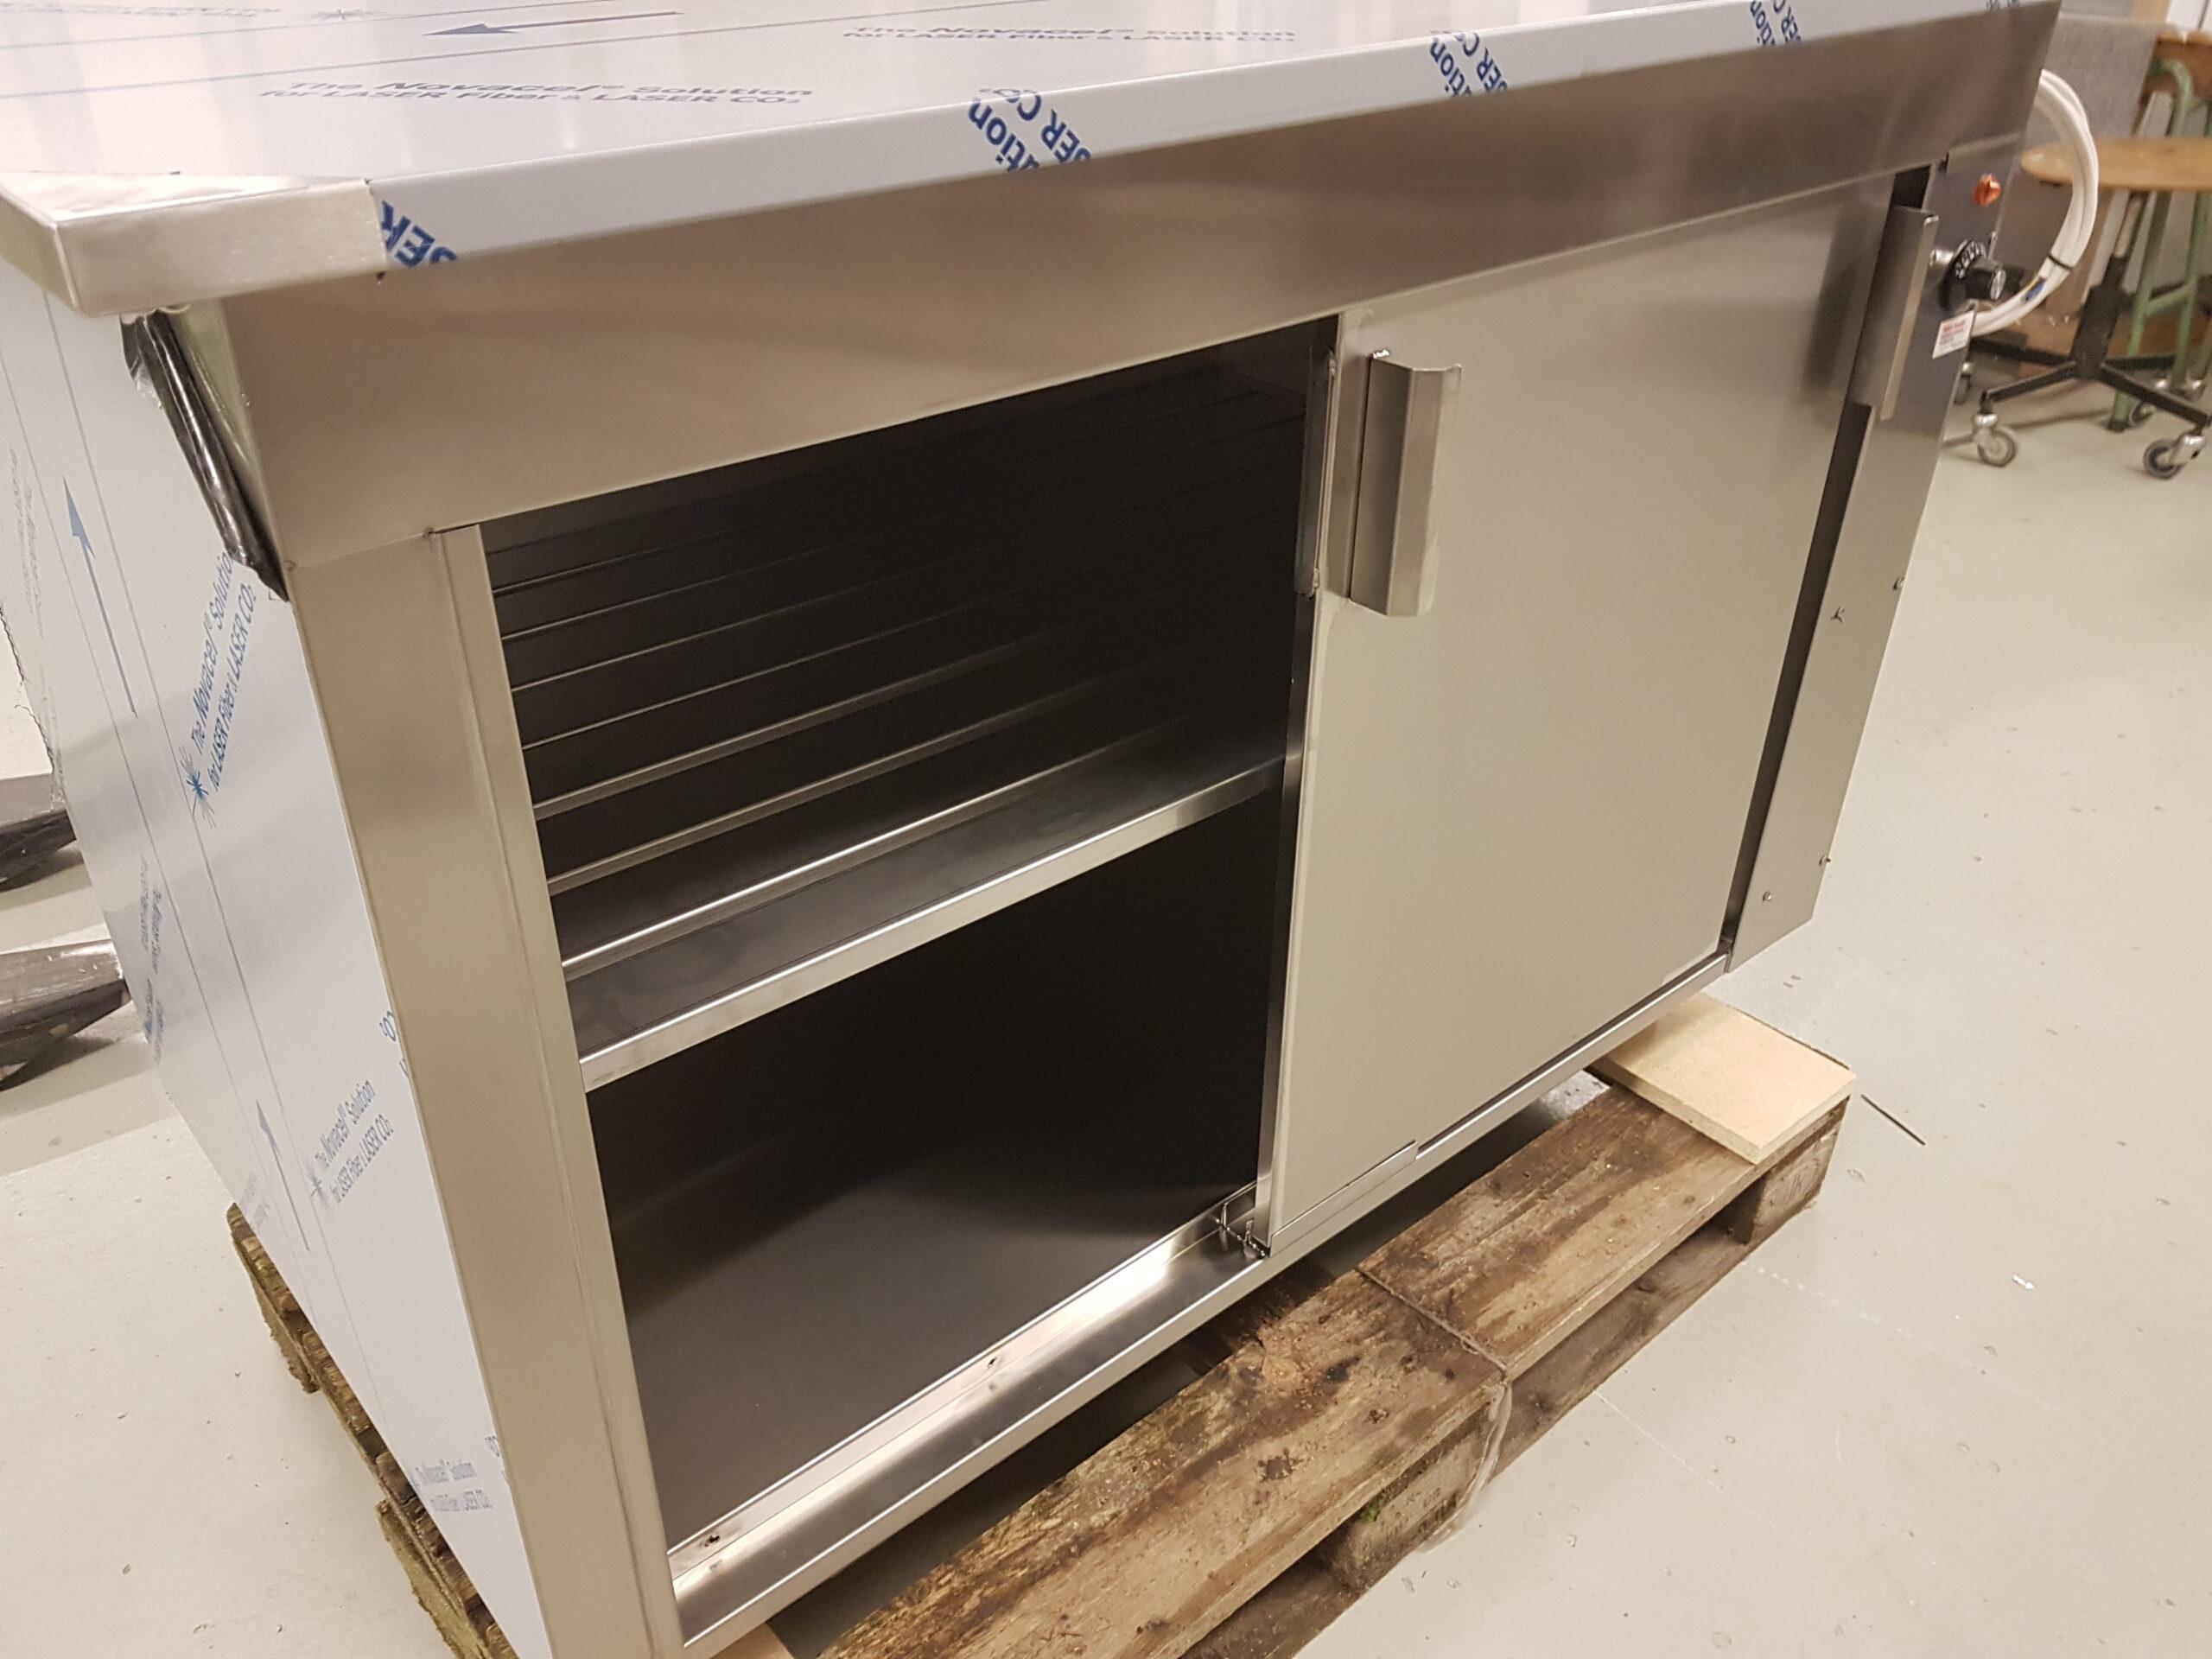 Rustfrit Wilno Rustfri ApS - Rustfrit varmeskab med skydelågervarmeskab med skydelåger